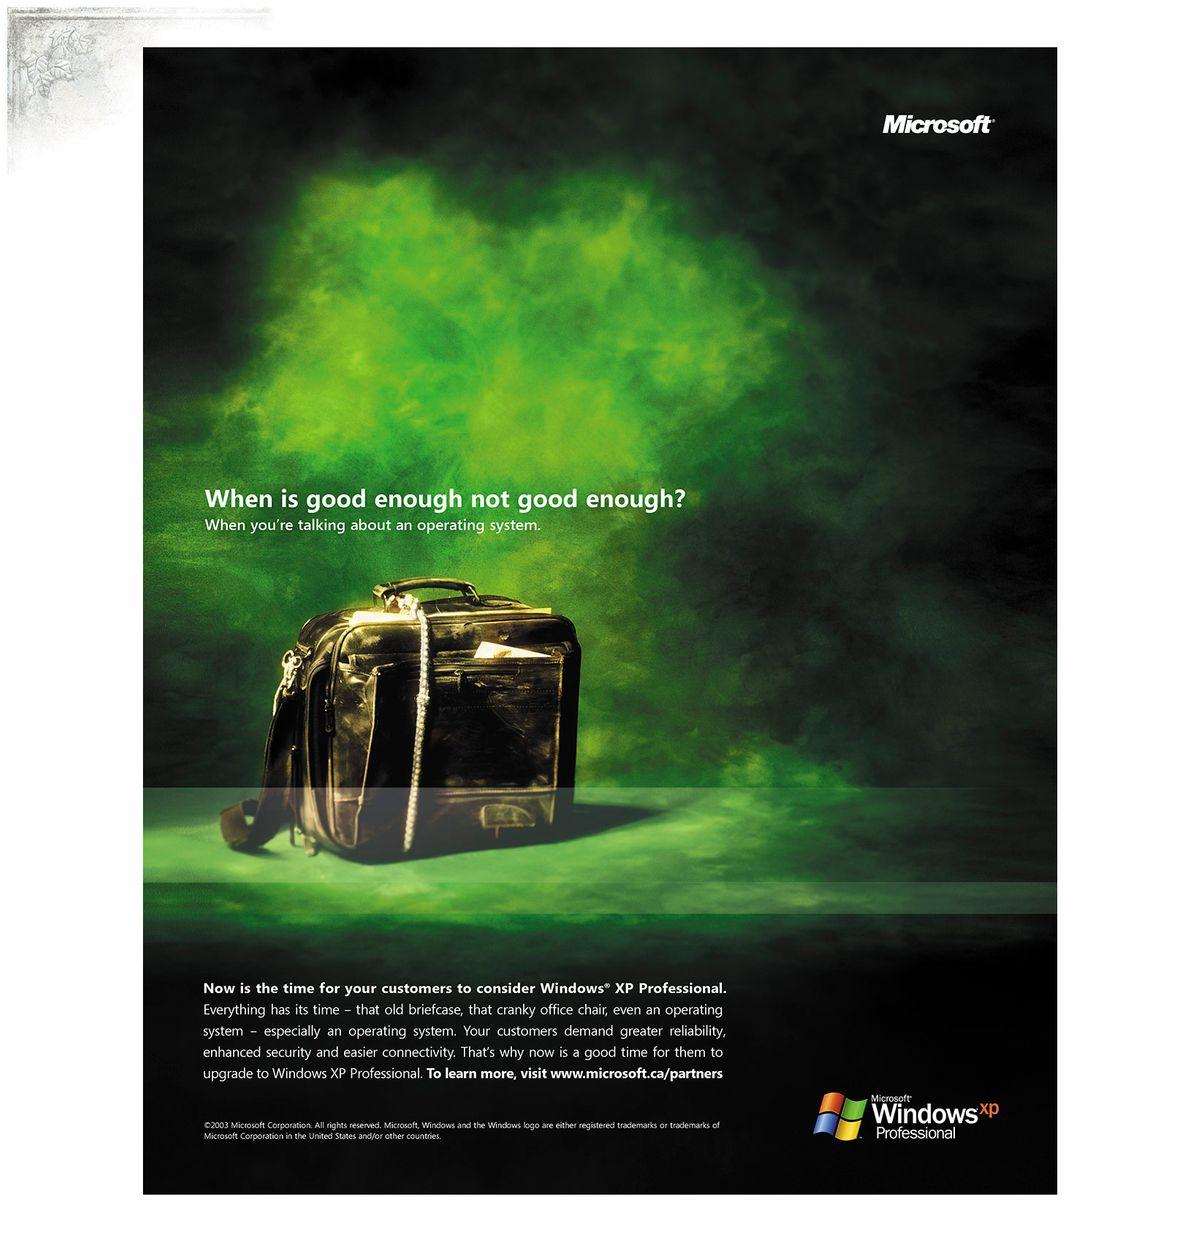 MicrosoftGreenPortfPage.jpg